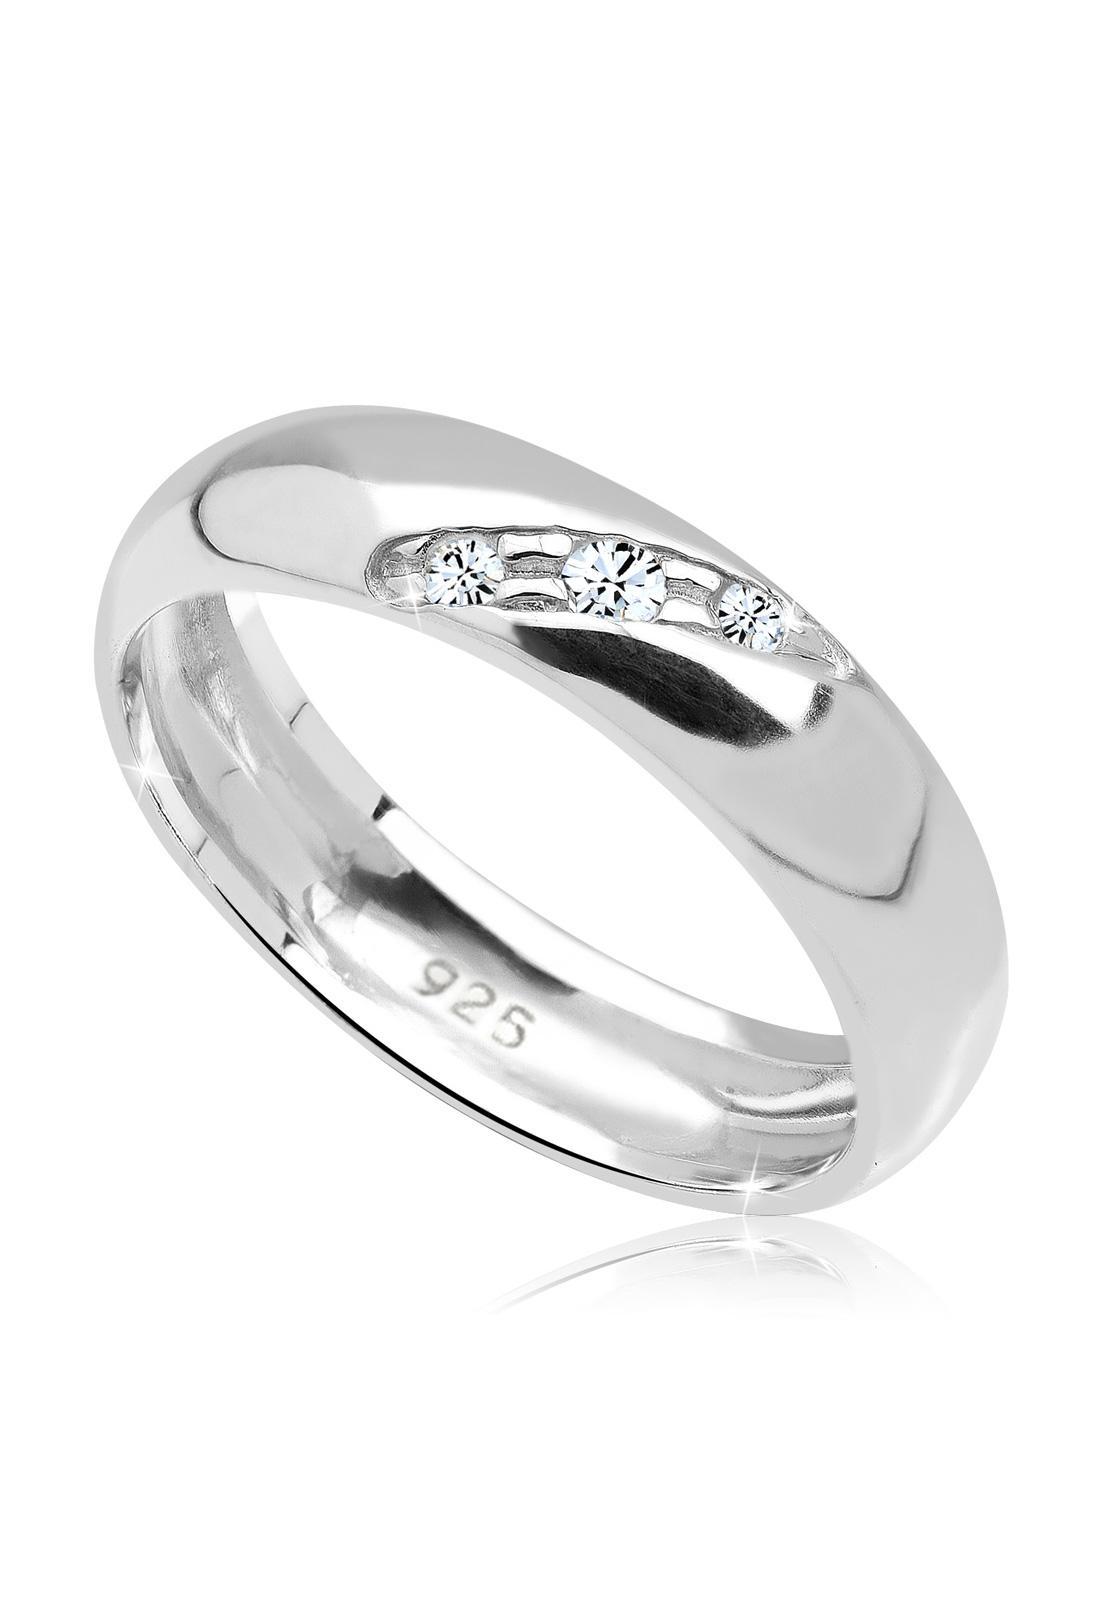 Promo Elli Germany 925 Silver Cincin Elegant Swarovski Crystals Putih Bali